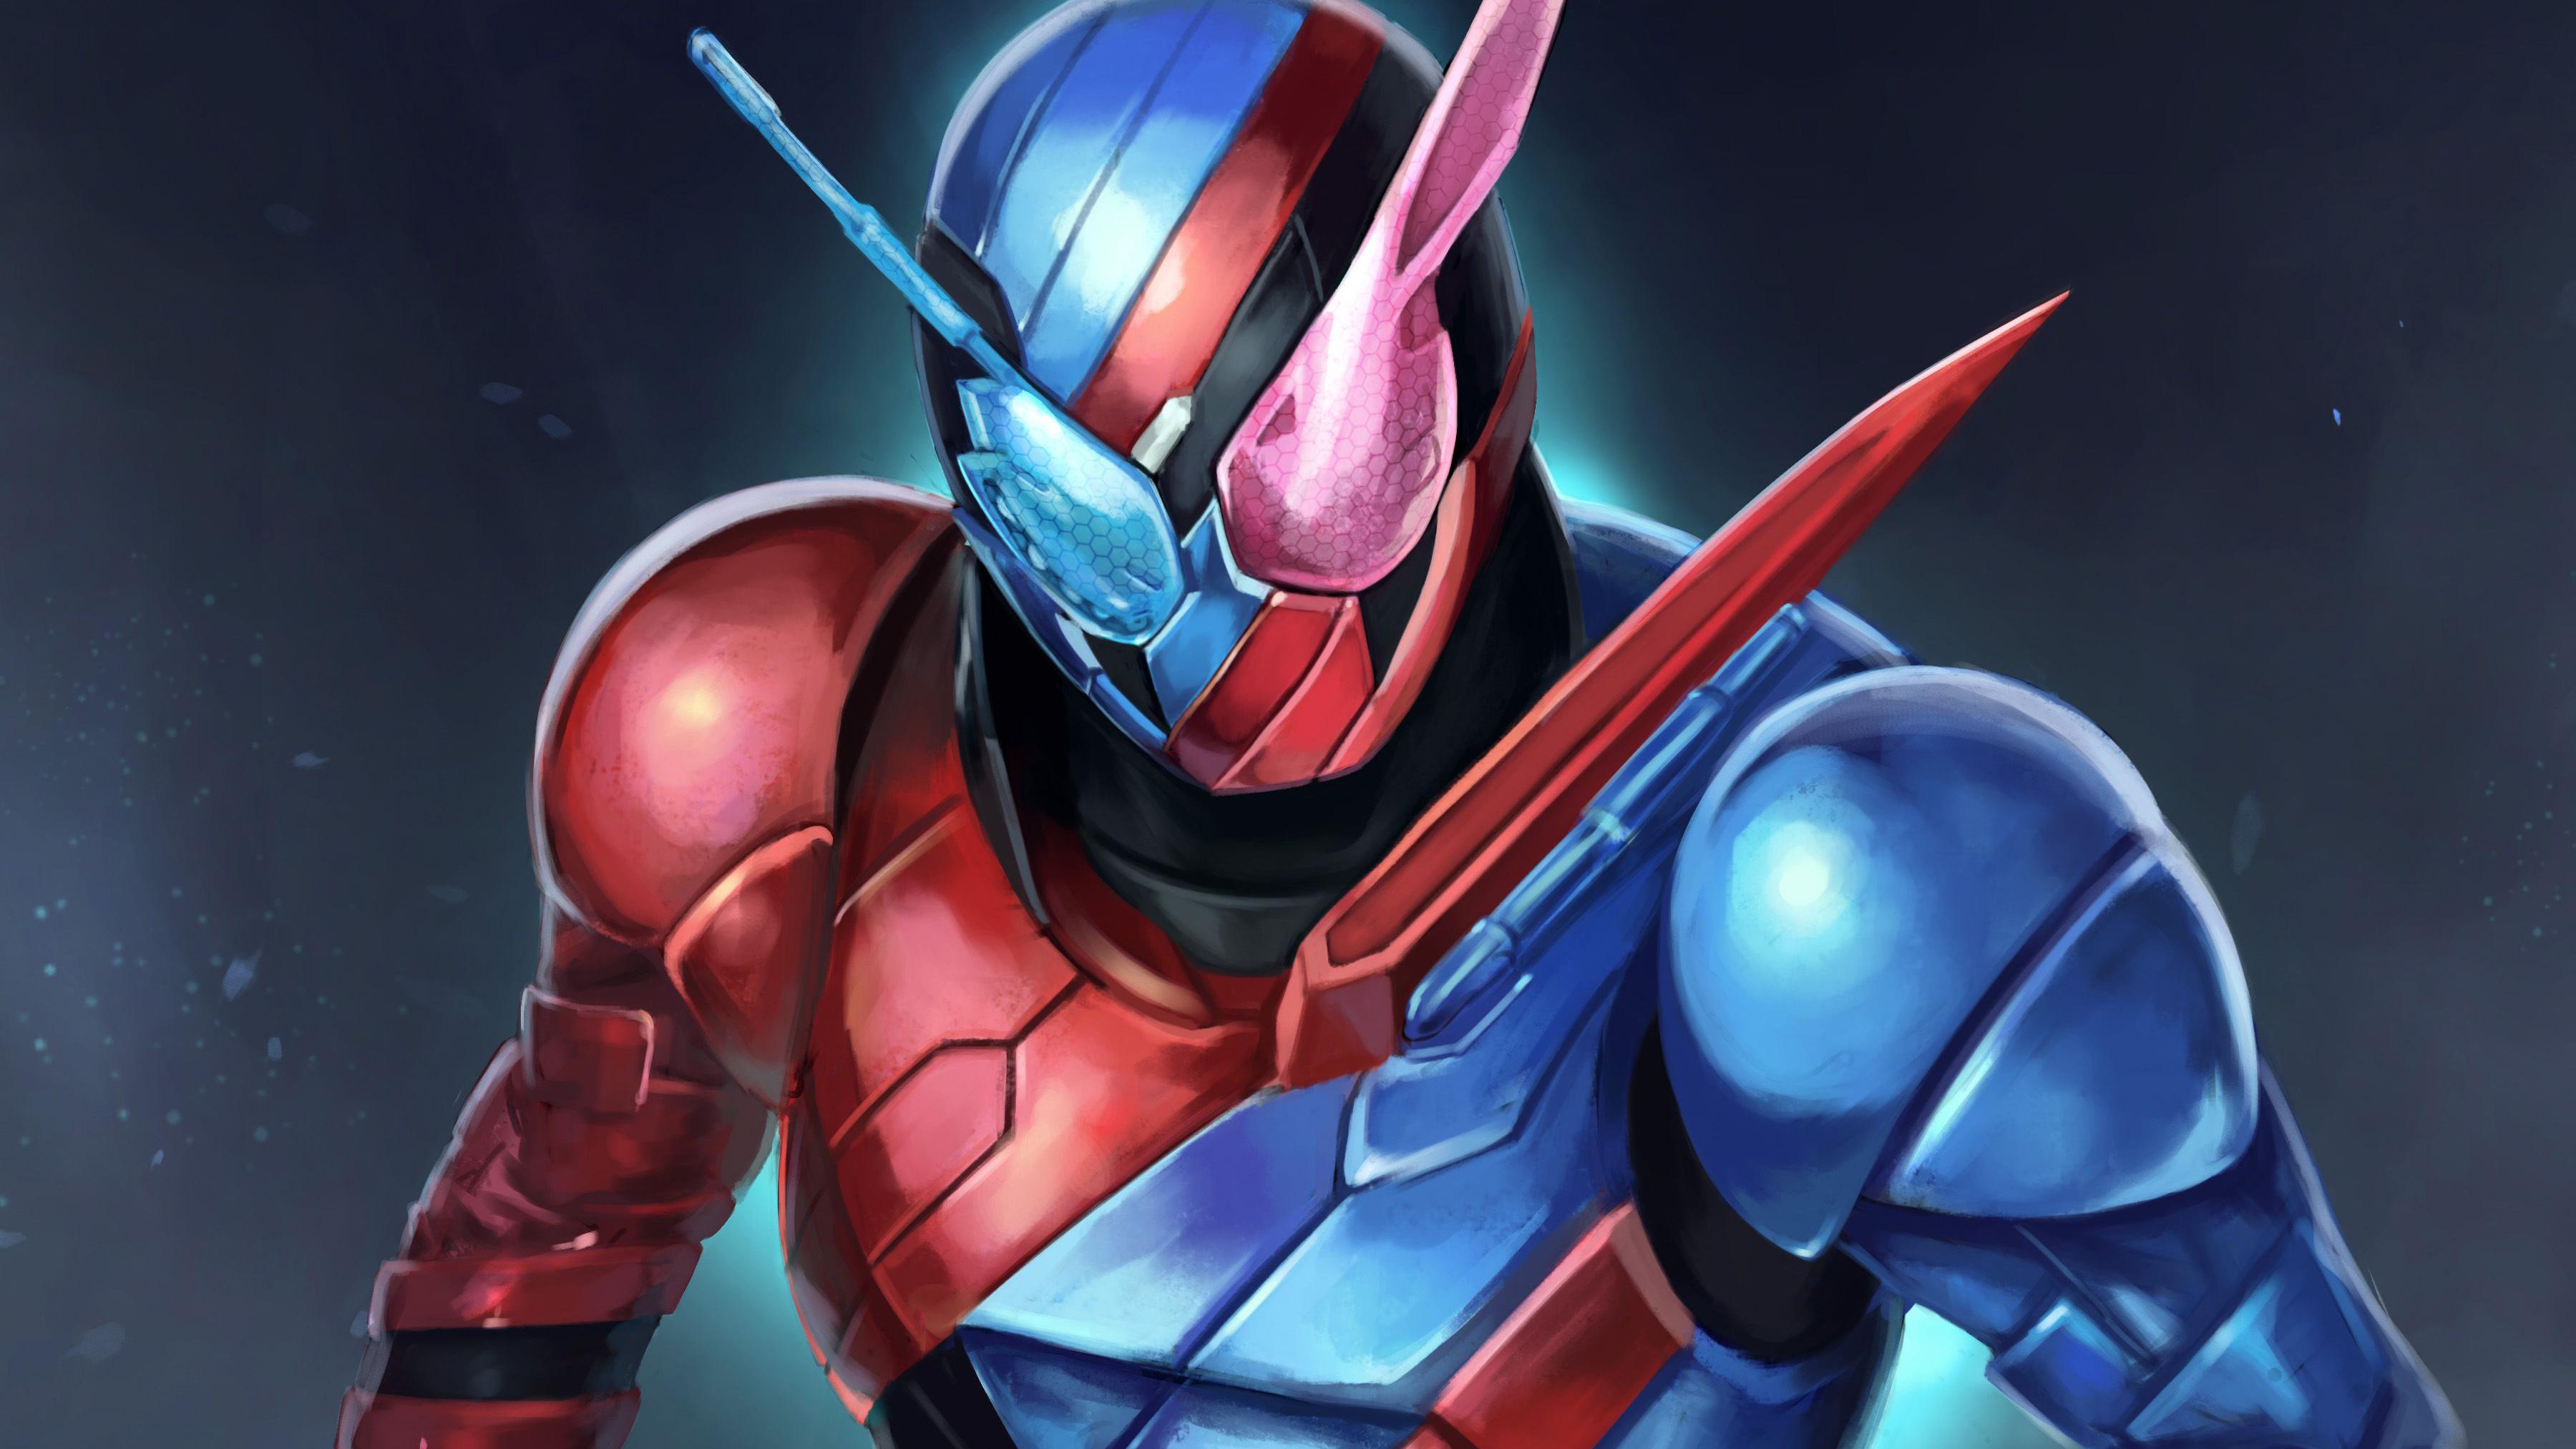 Download Wallpaper Kamen Rider X